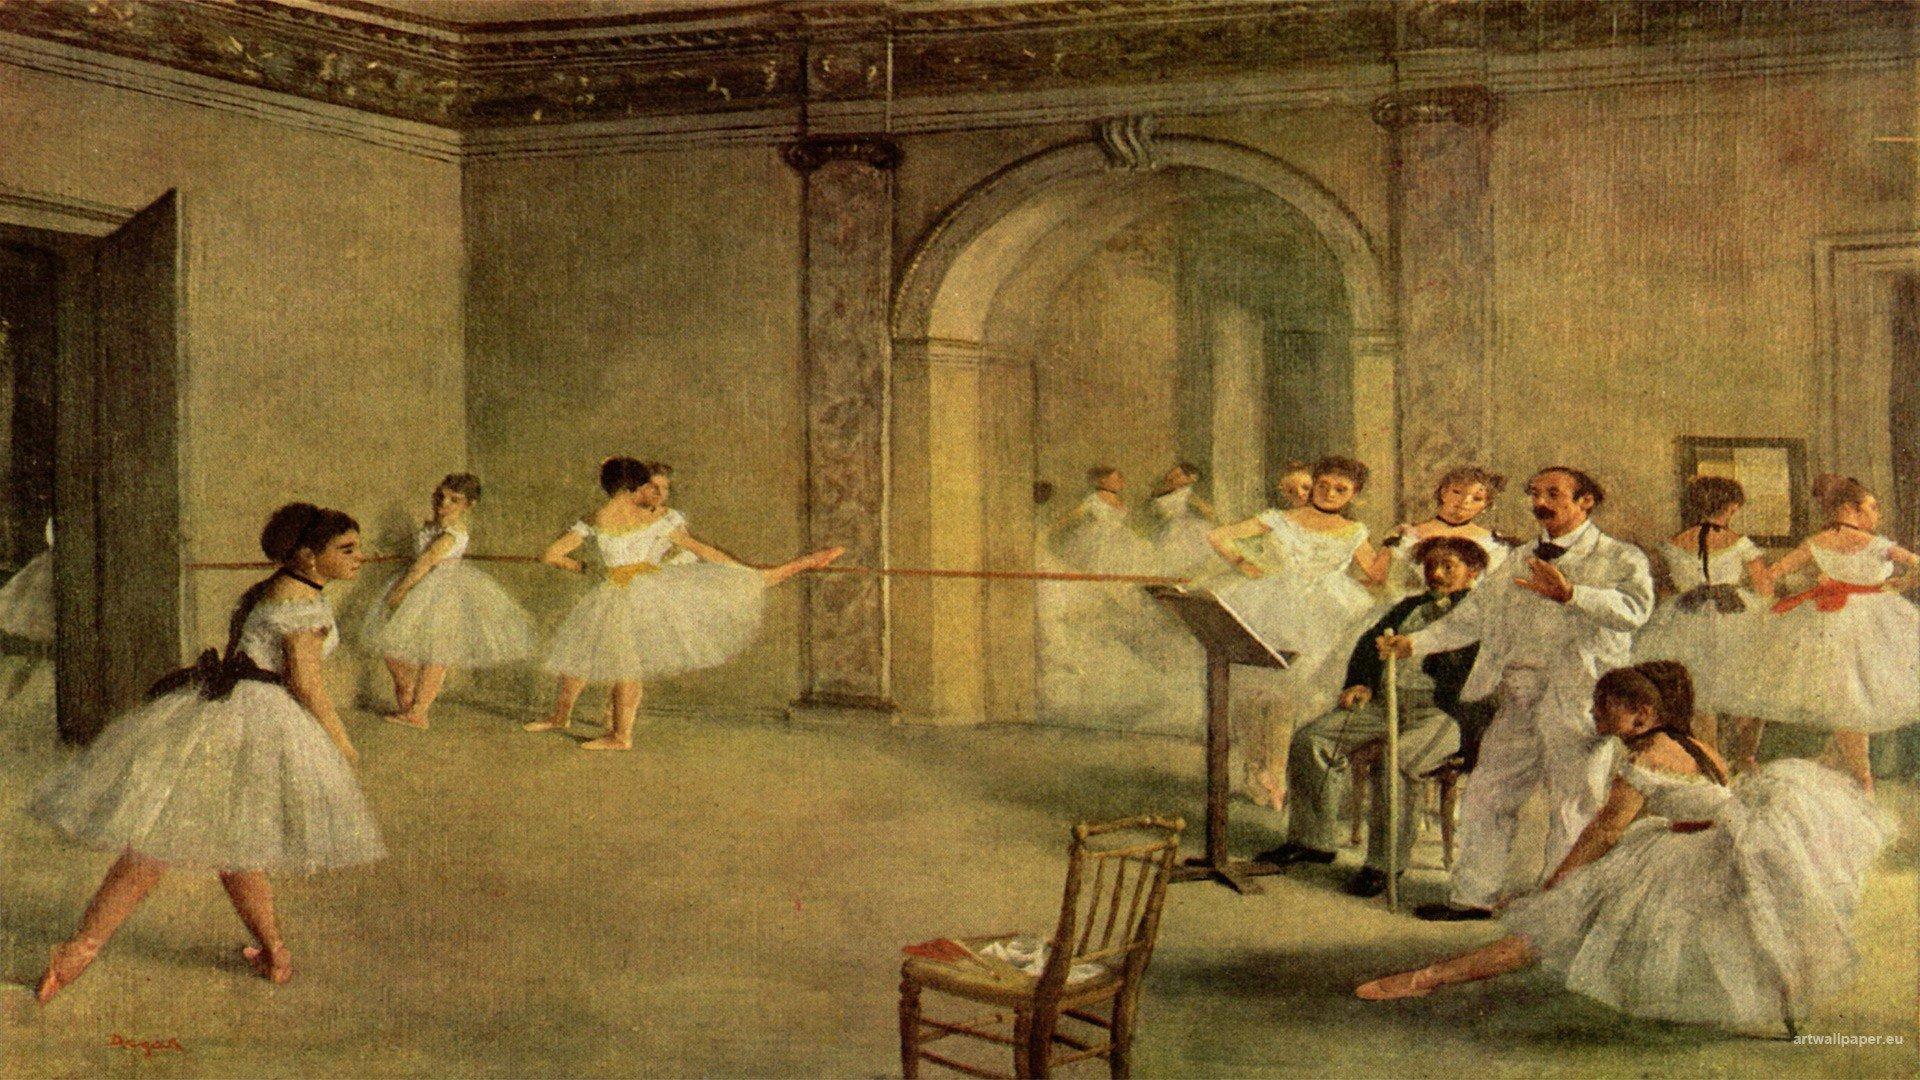 paintings artwork dancing impressionist painting edgar